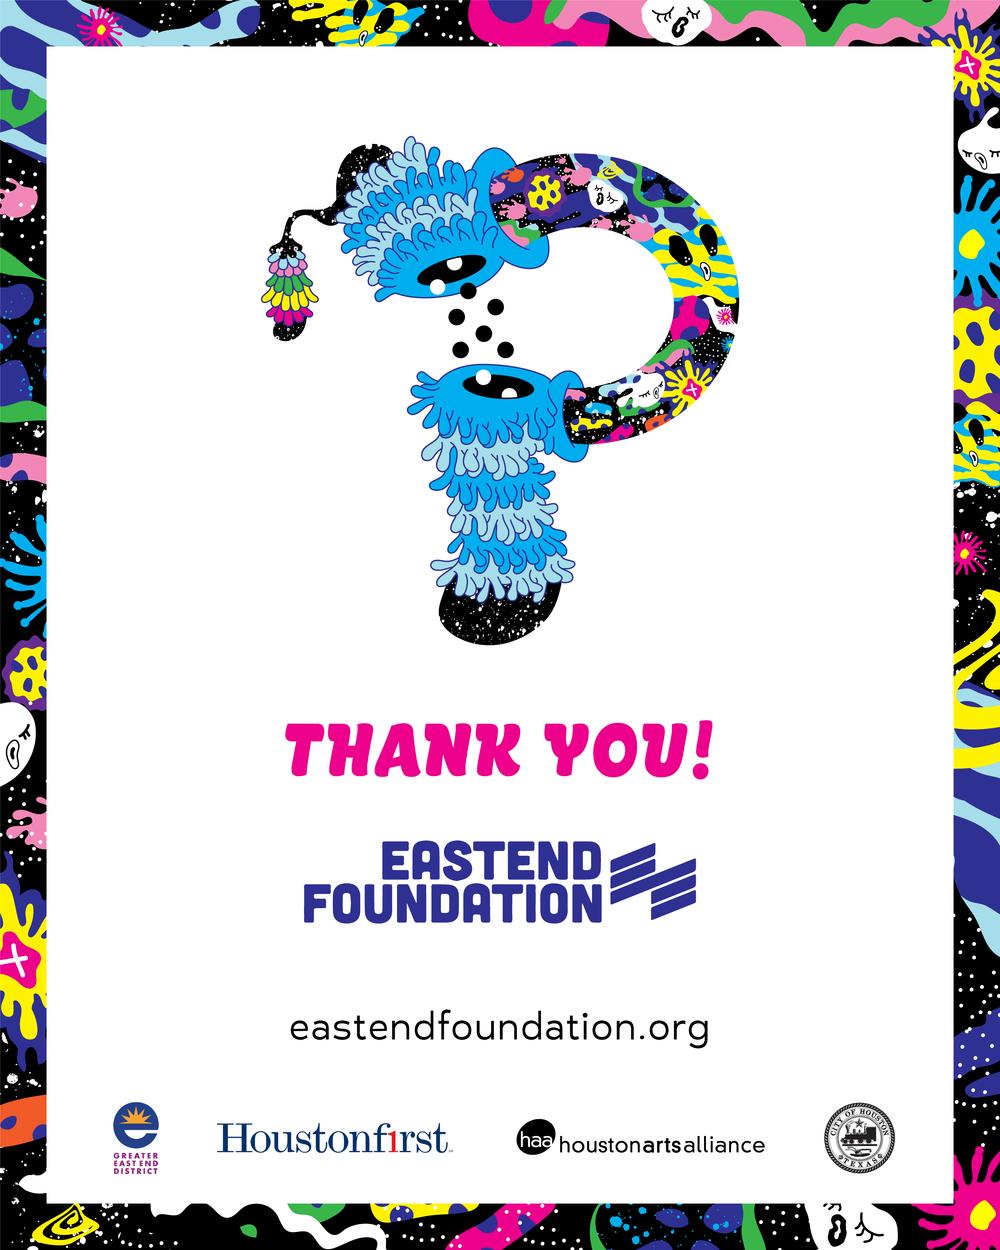 Pinatafest_2018_East_End_Foundation_Houston_007.png